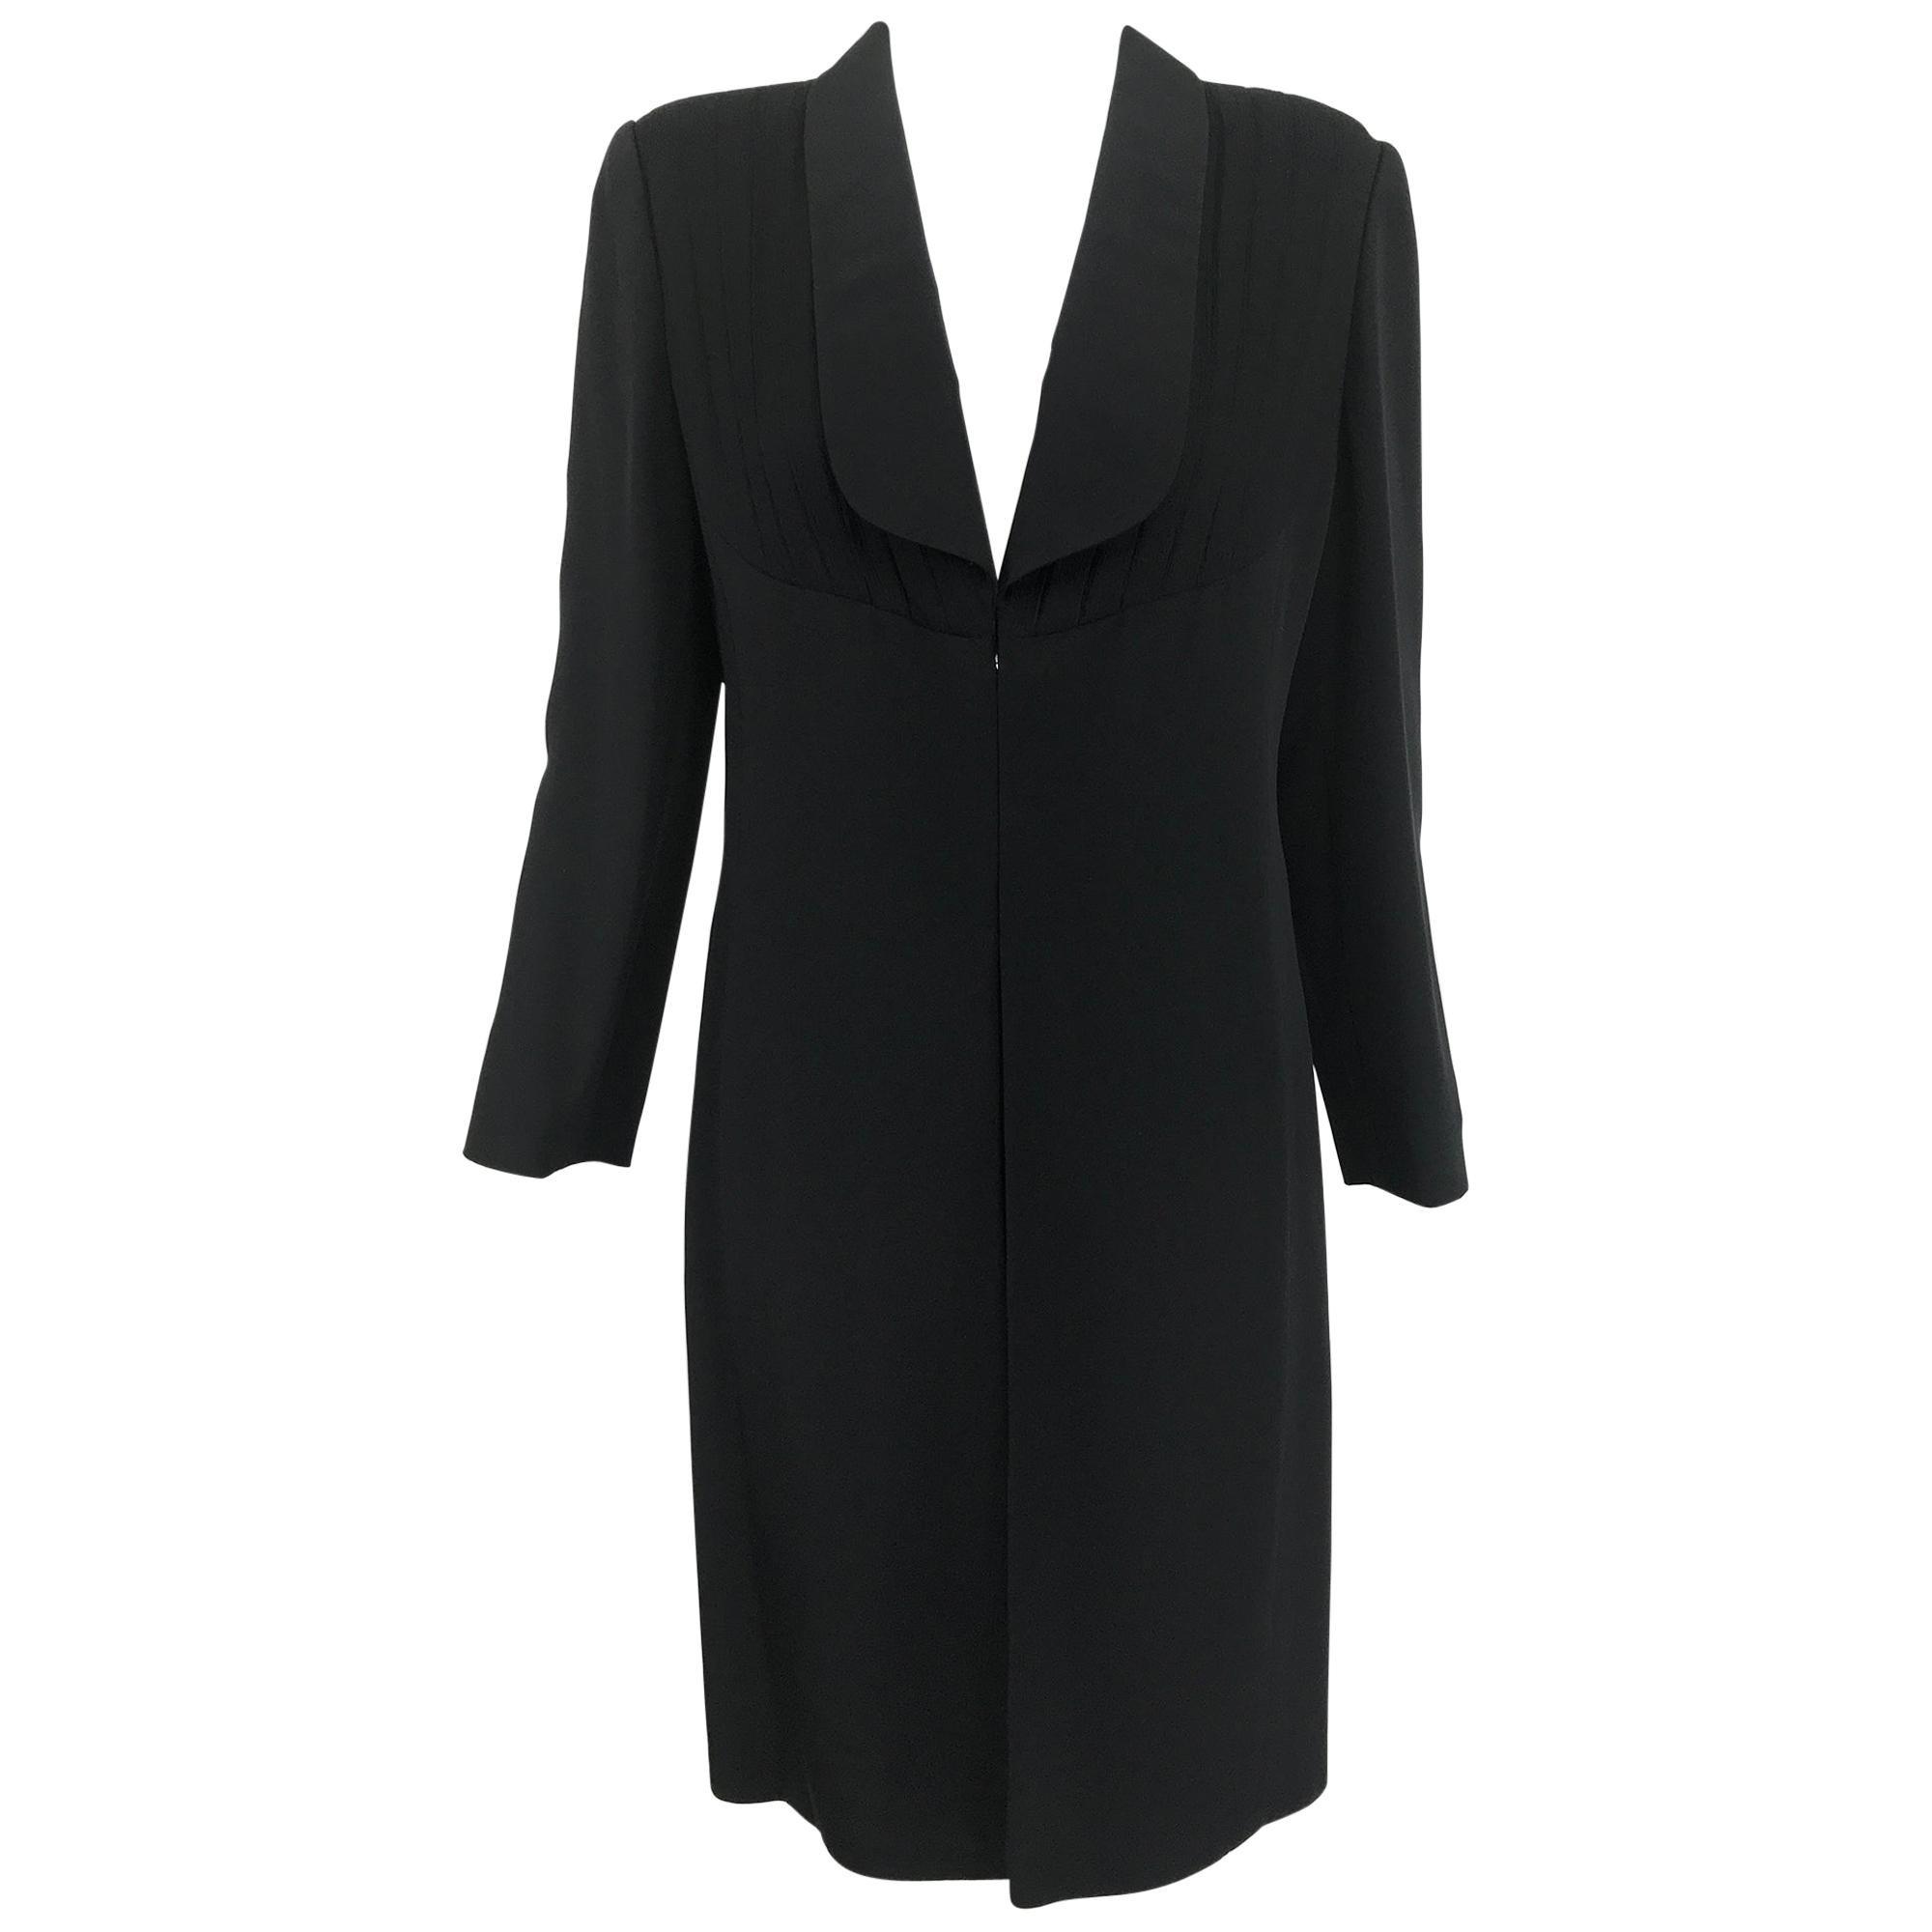 Vintage Galanos Black SIlk Coat Pleated chiffon Yoke Fronts